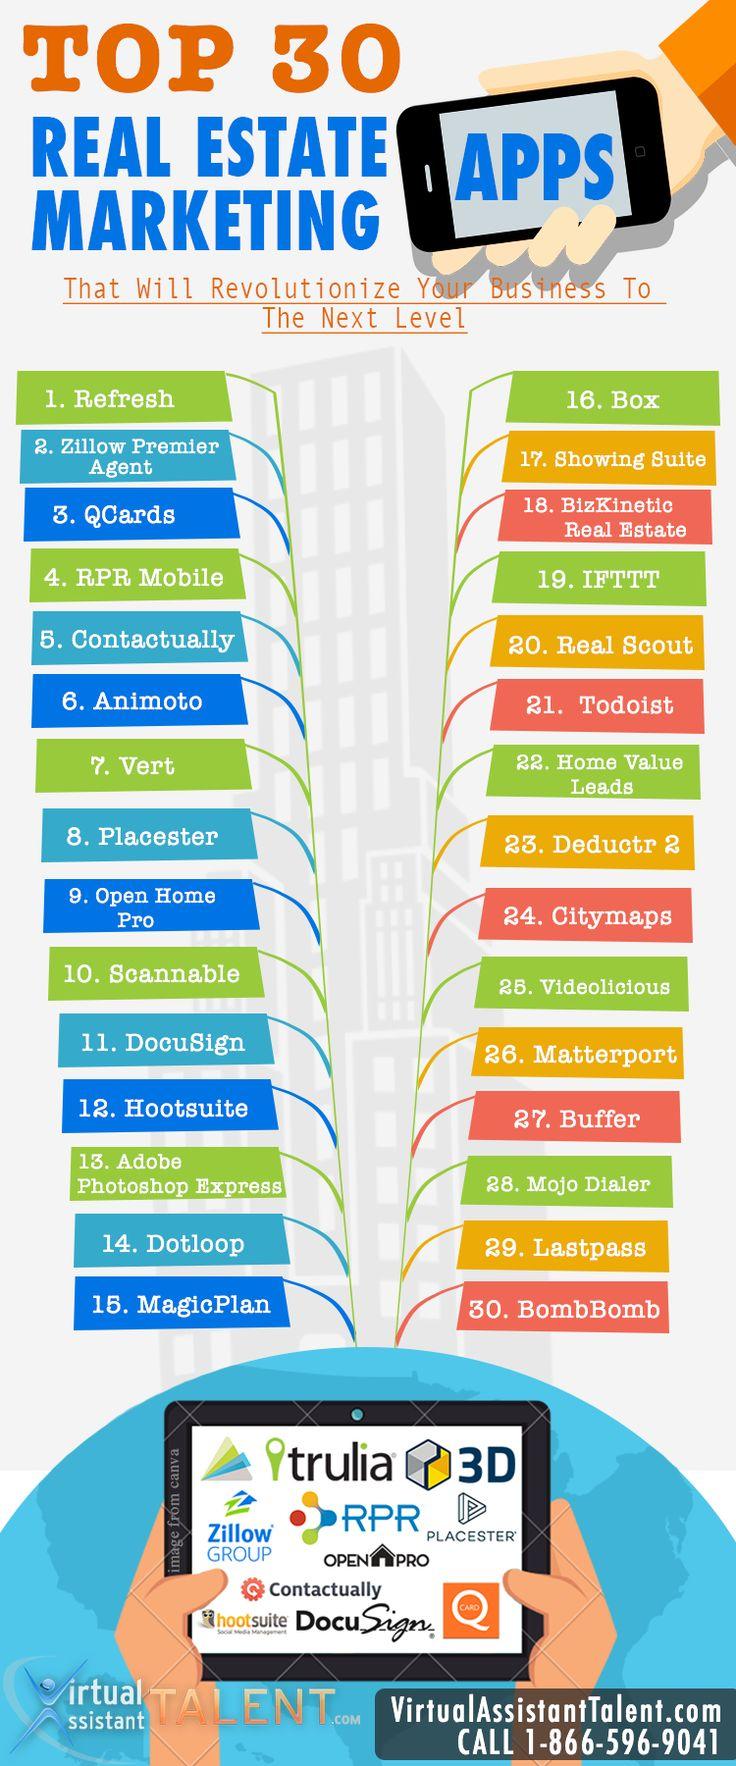 30 Real Estate Marketing apps revolutionize business